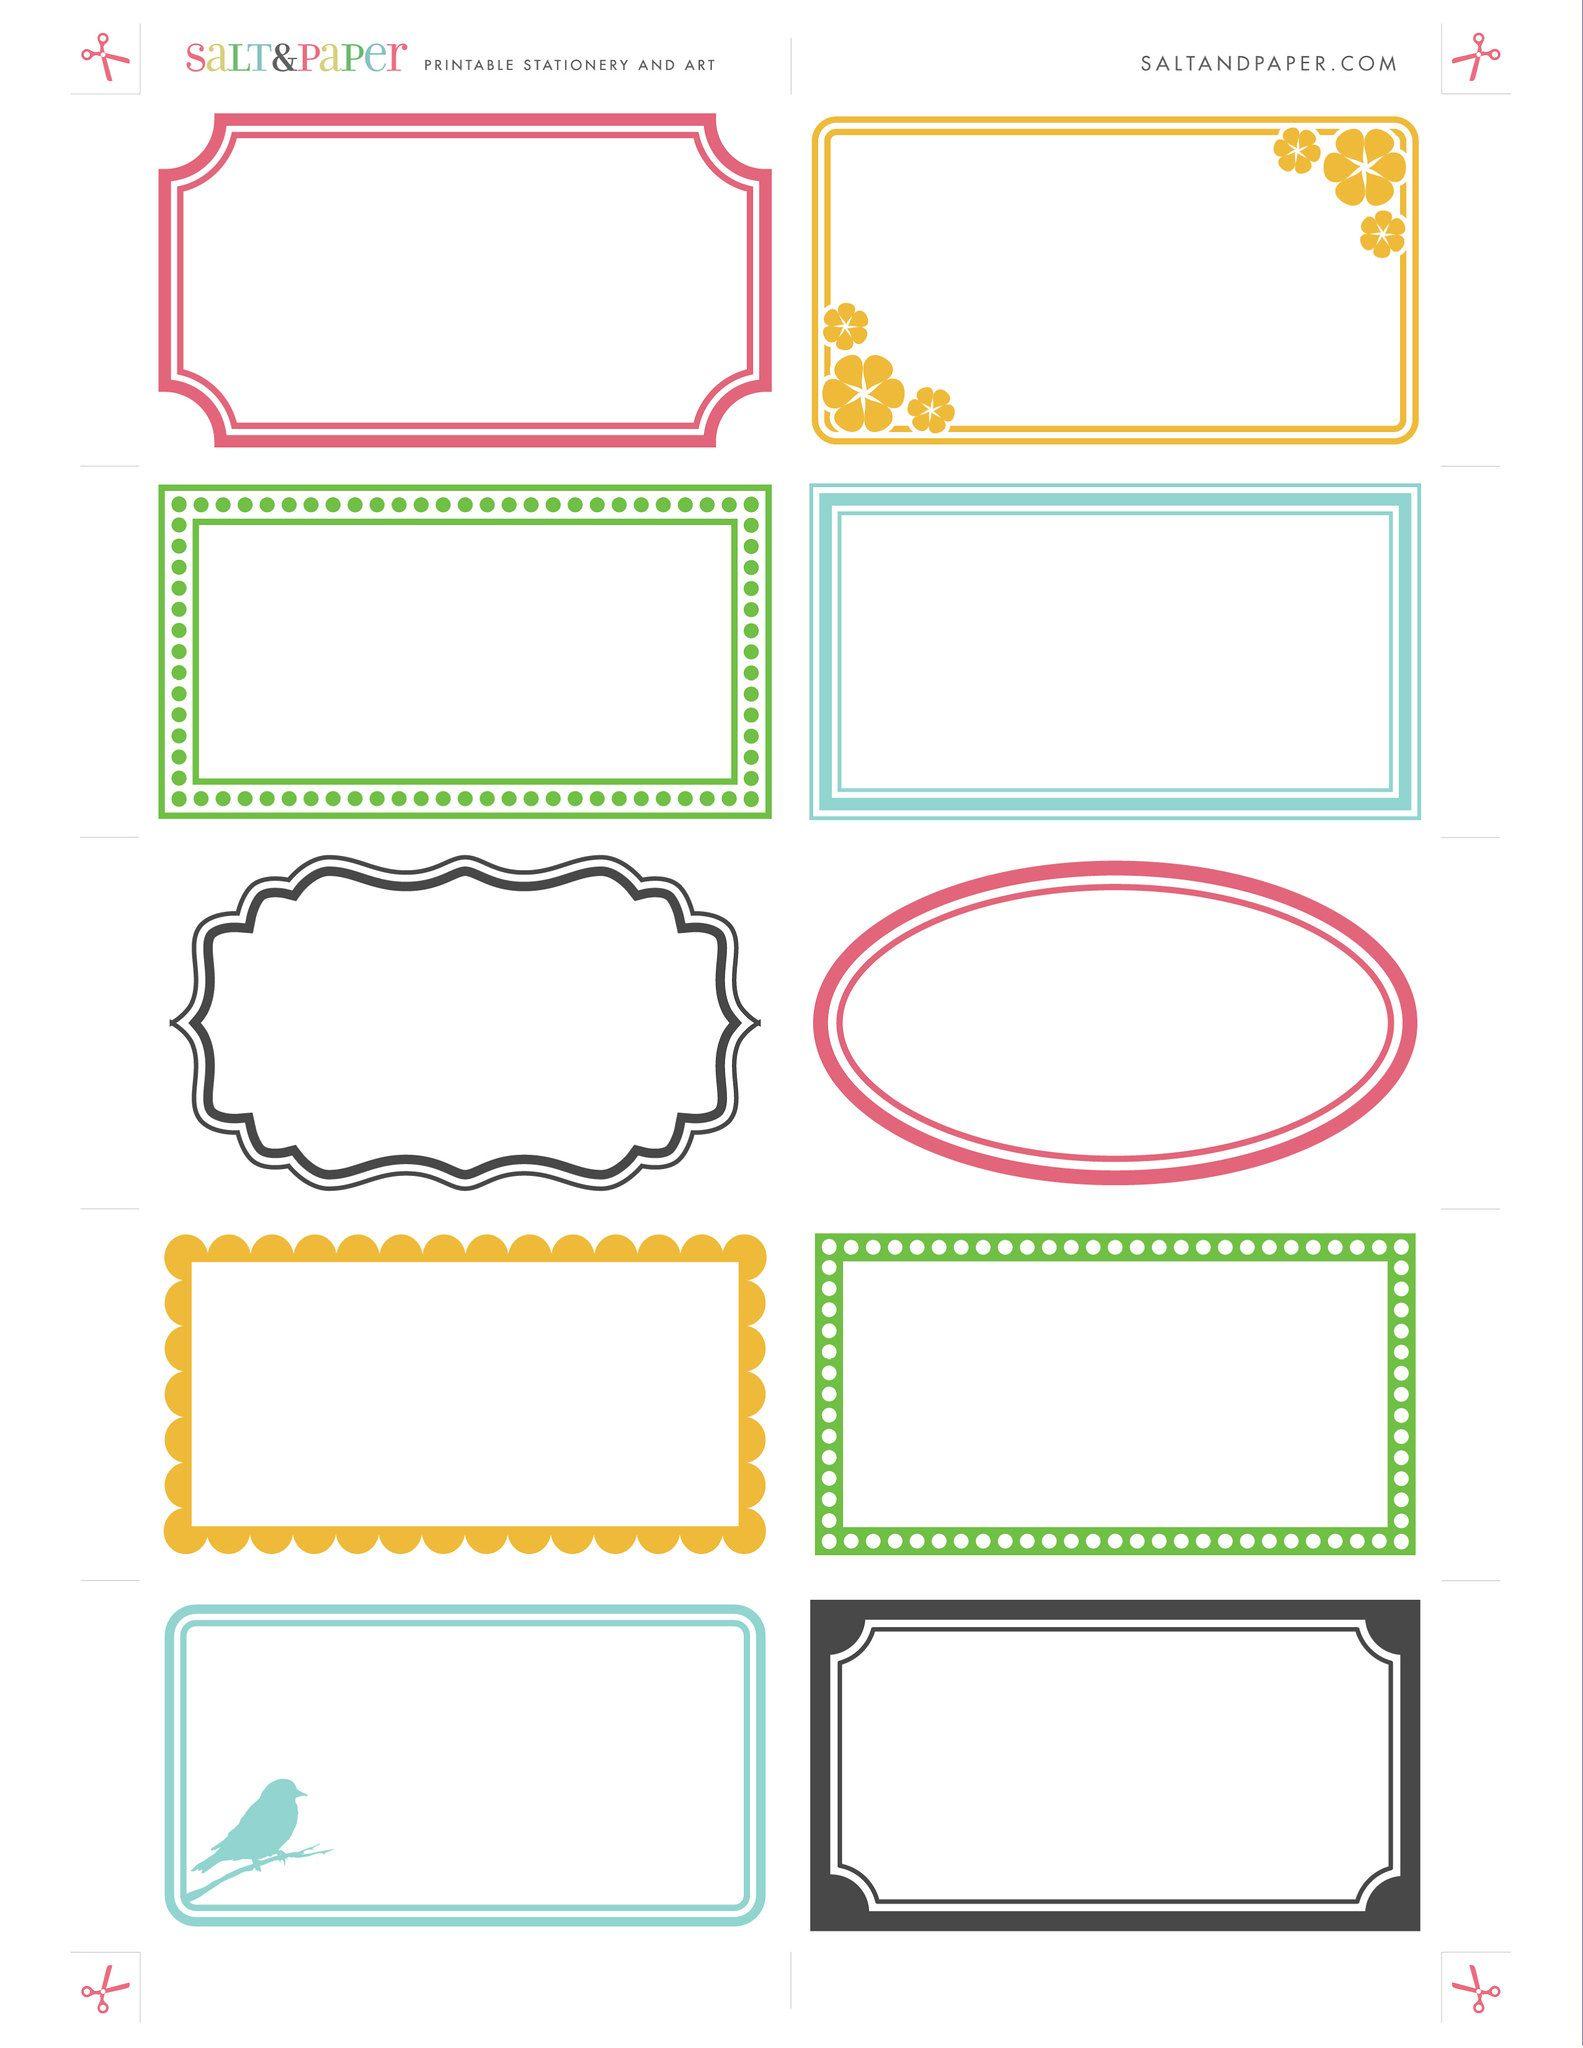 Printable Labels From Saltandpaper Com Labels Printables Free Templates Free Printable Business Cards Printable Label Templates